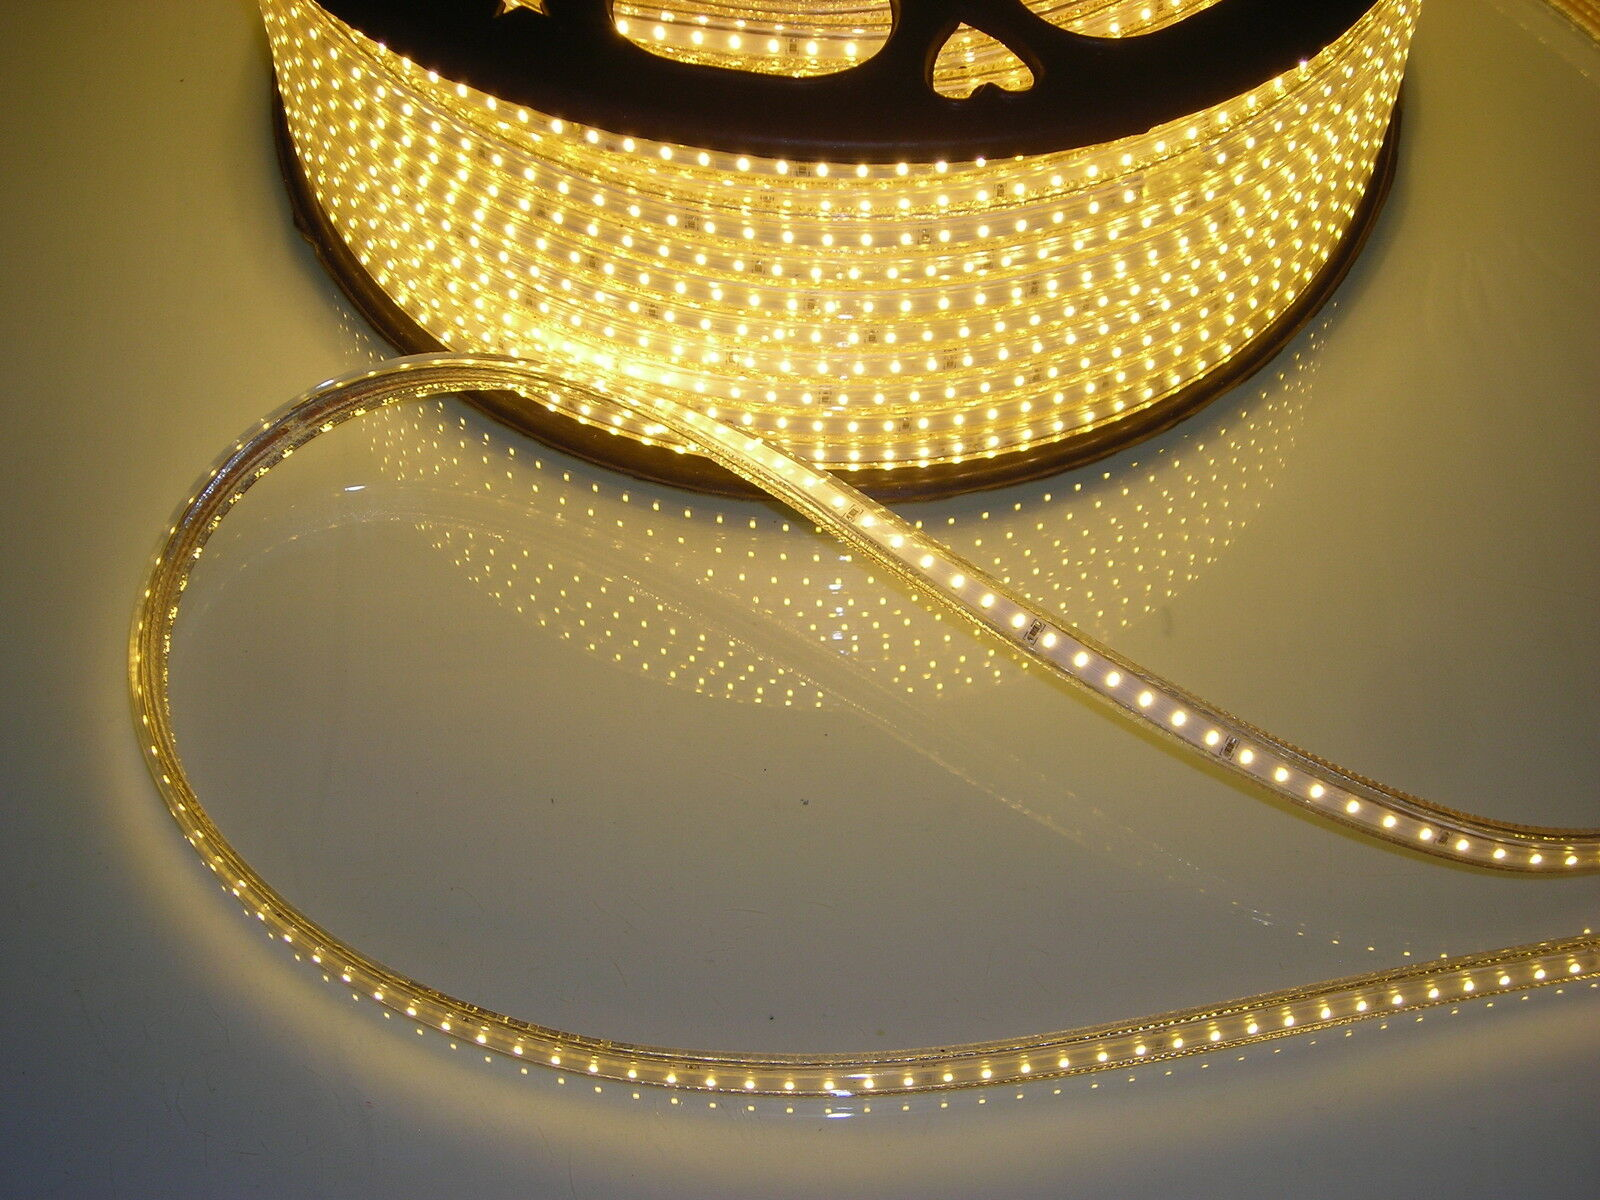 Bande LED blanc chaud 220V 230V 120 SMD Royaume-Uni 3014 imperméable, Royaume-Uni SMD ou cordon d'aliHommes tation de l'UE libre 9dcf41